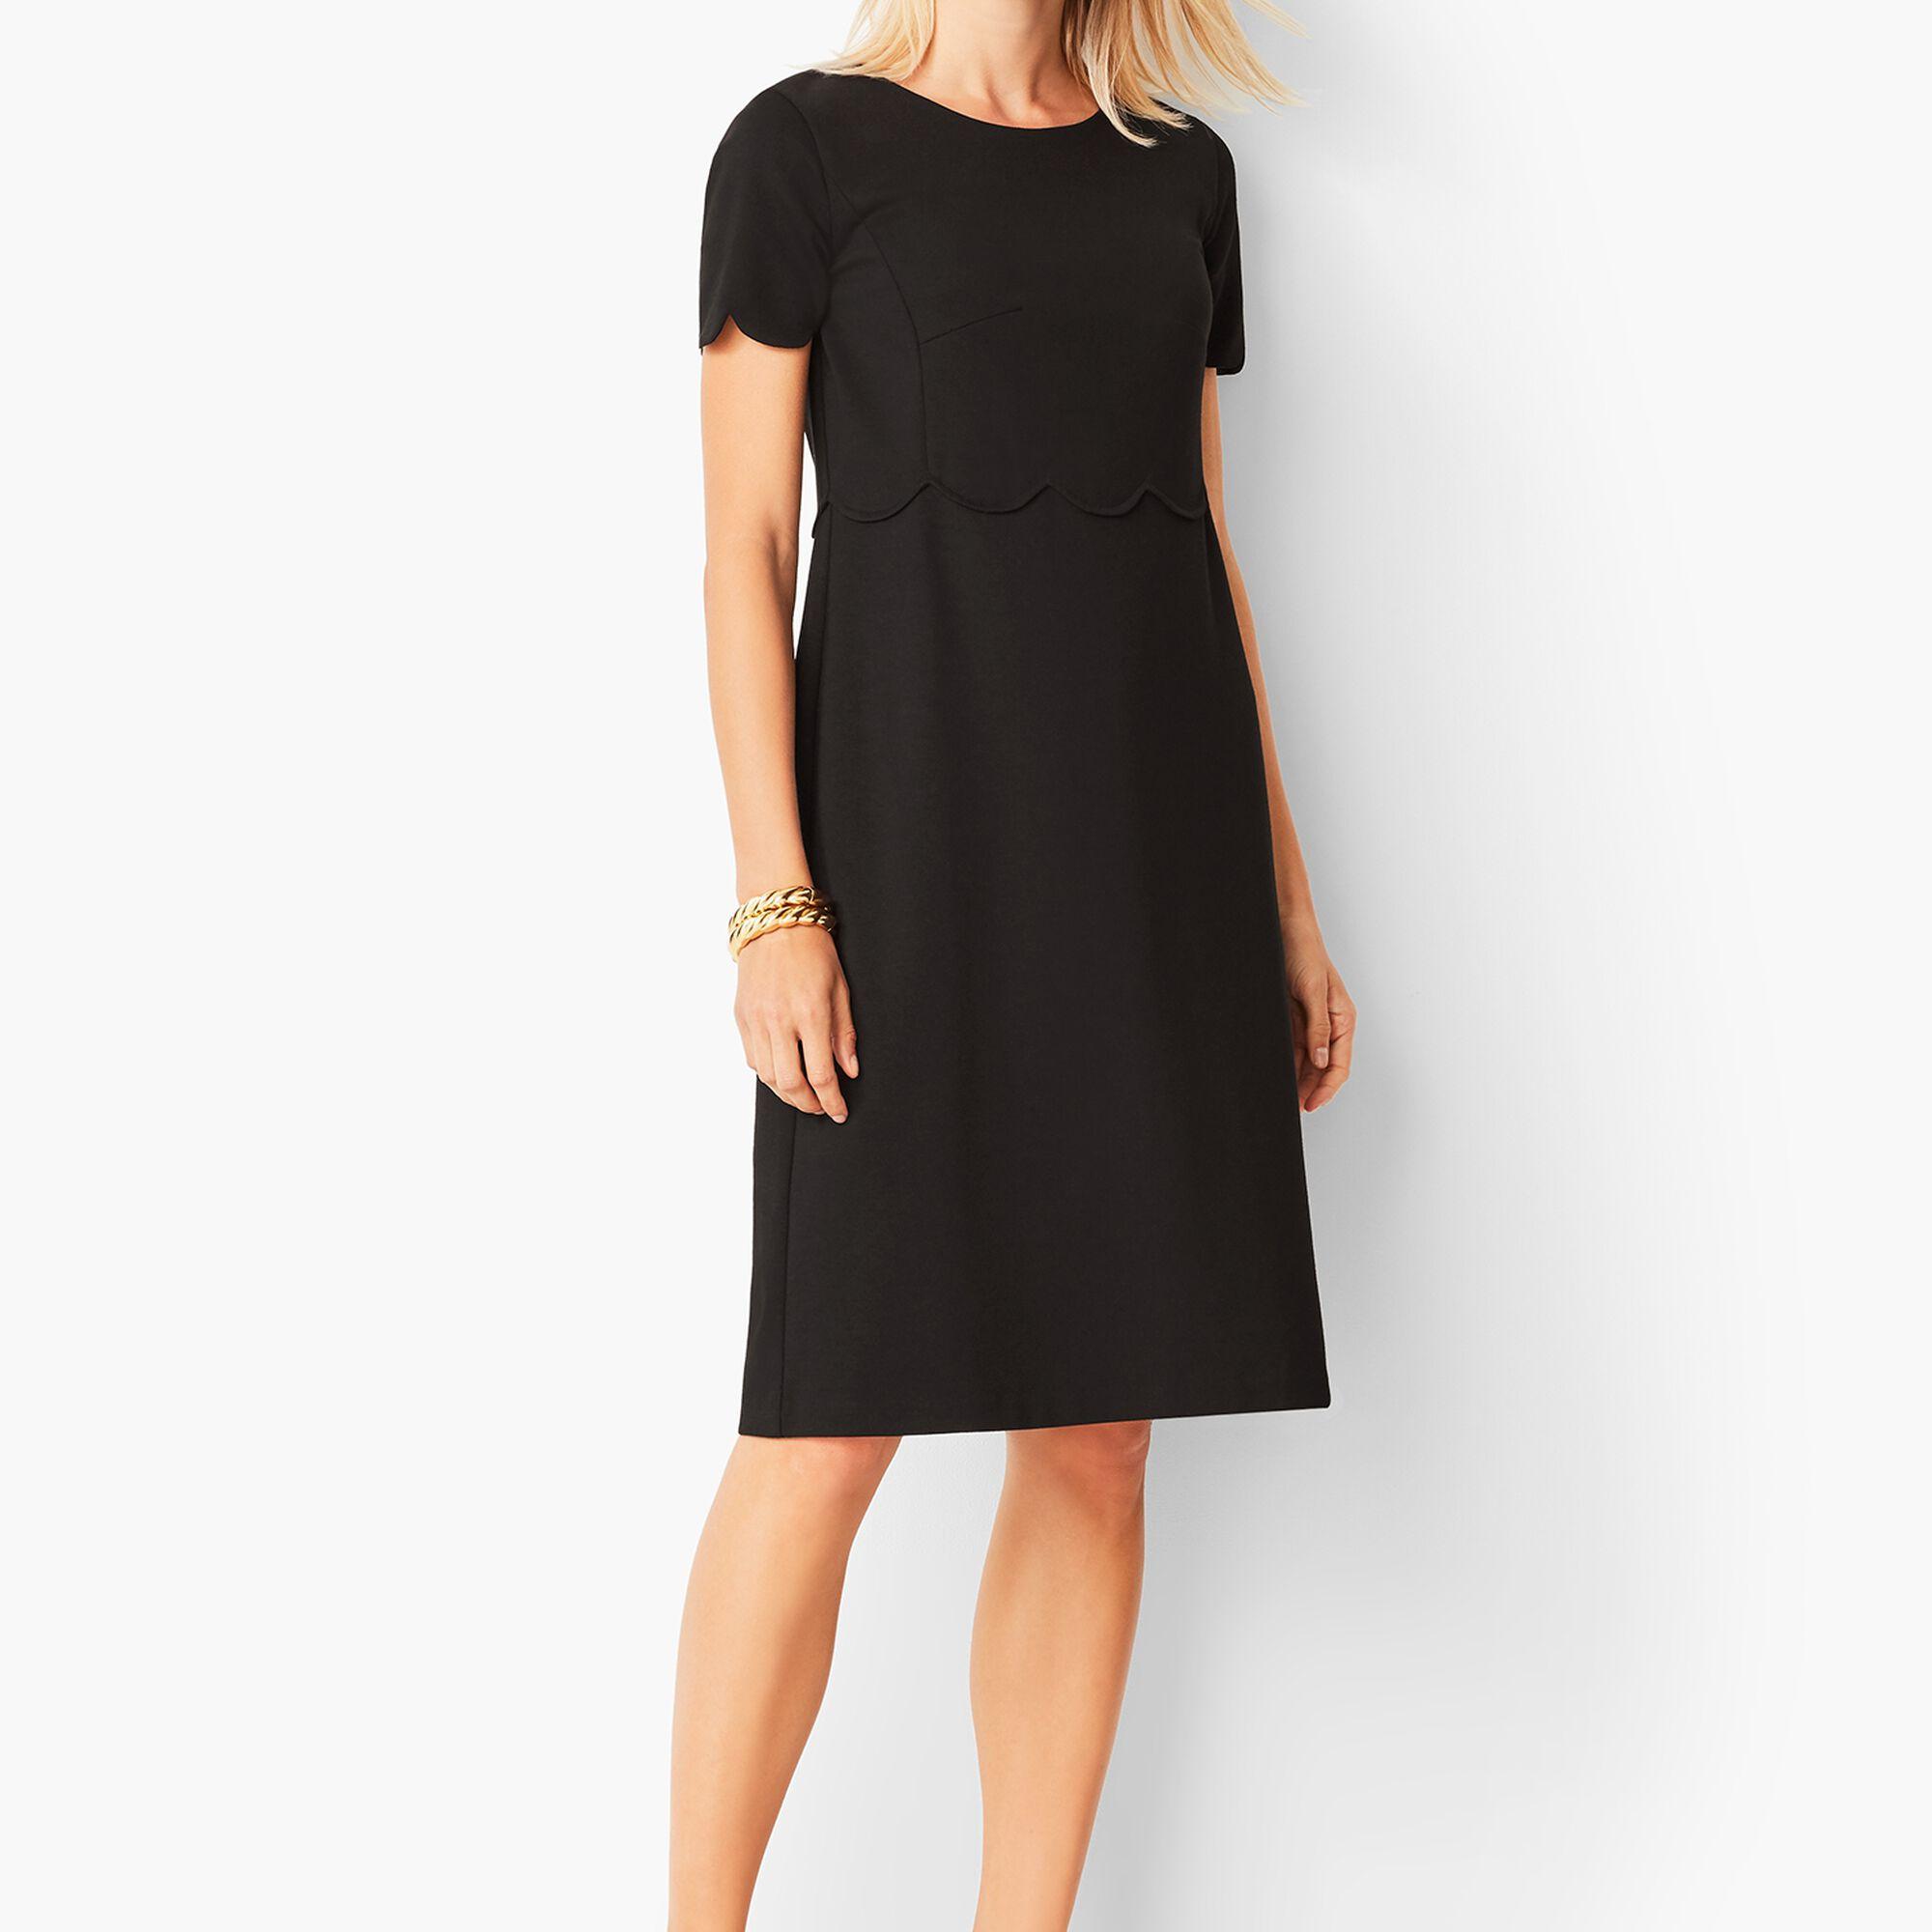 47dd7a2ffd41 Refined Scallop-Sleeve Ponte Dress - Black Opens a New Window.